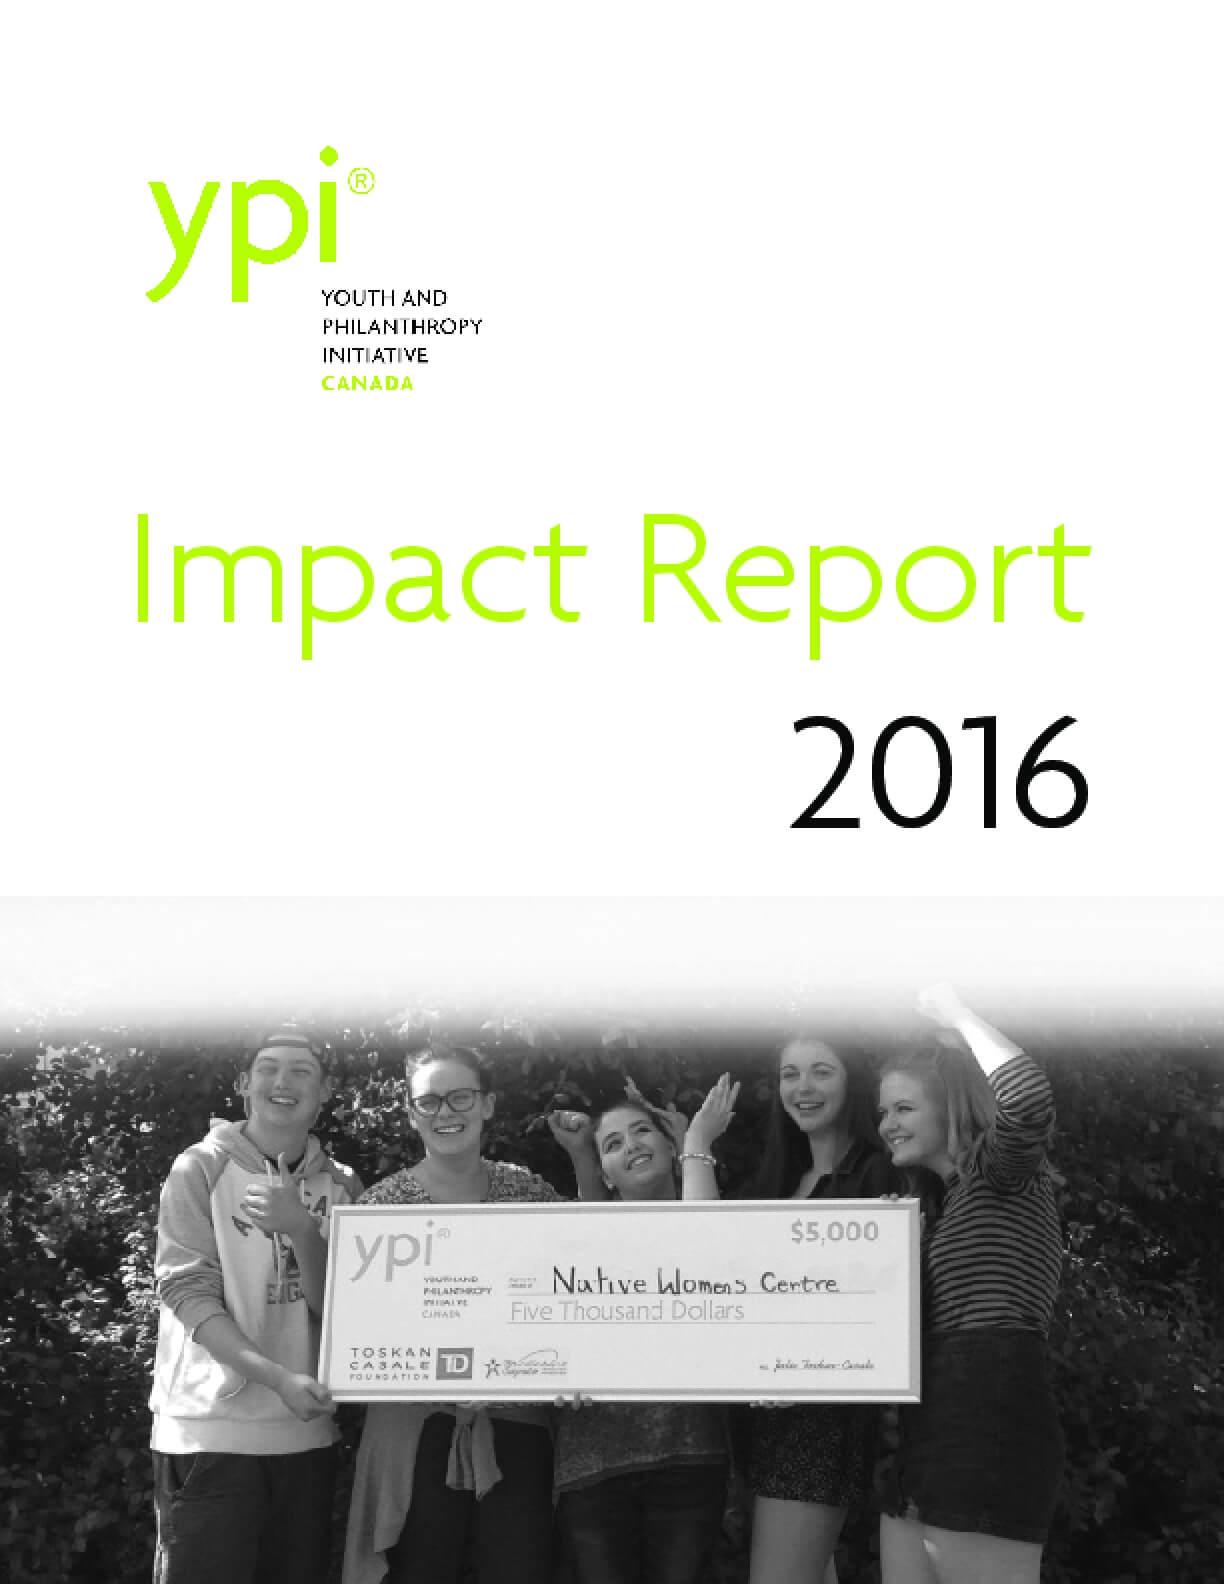 YPI Canada Impact Report 2016